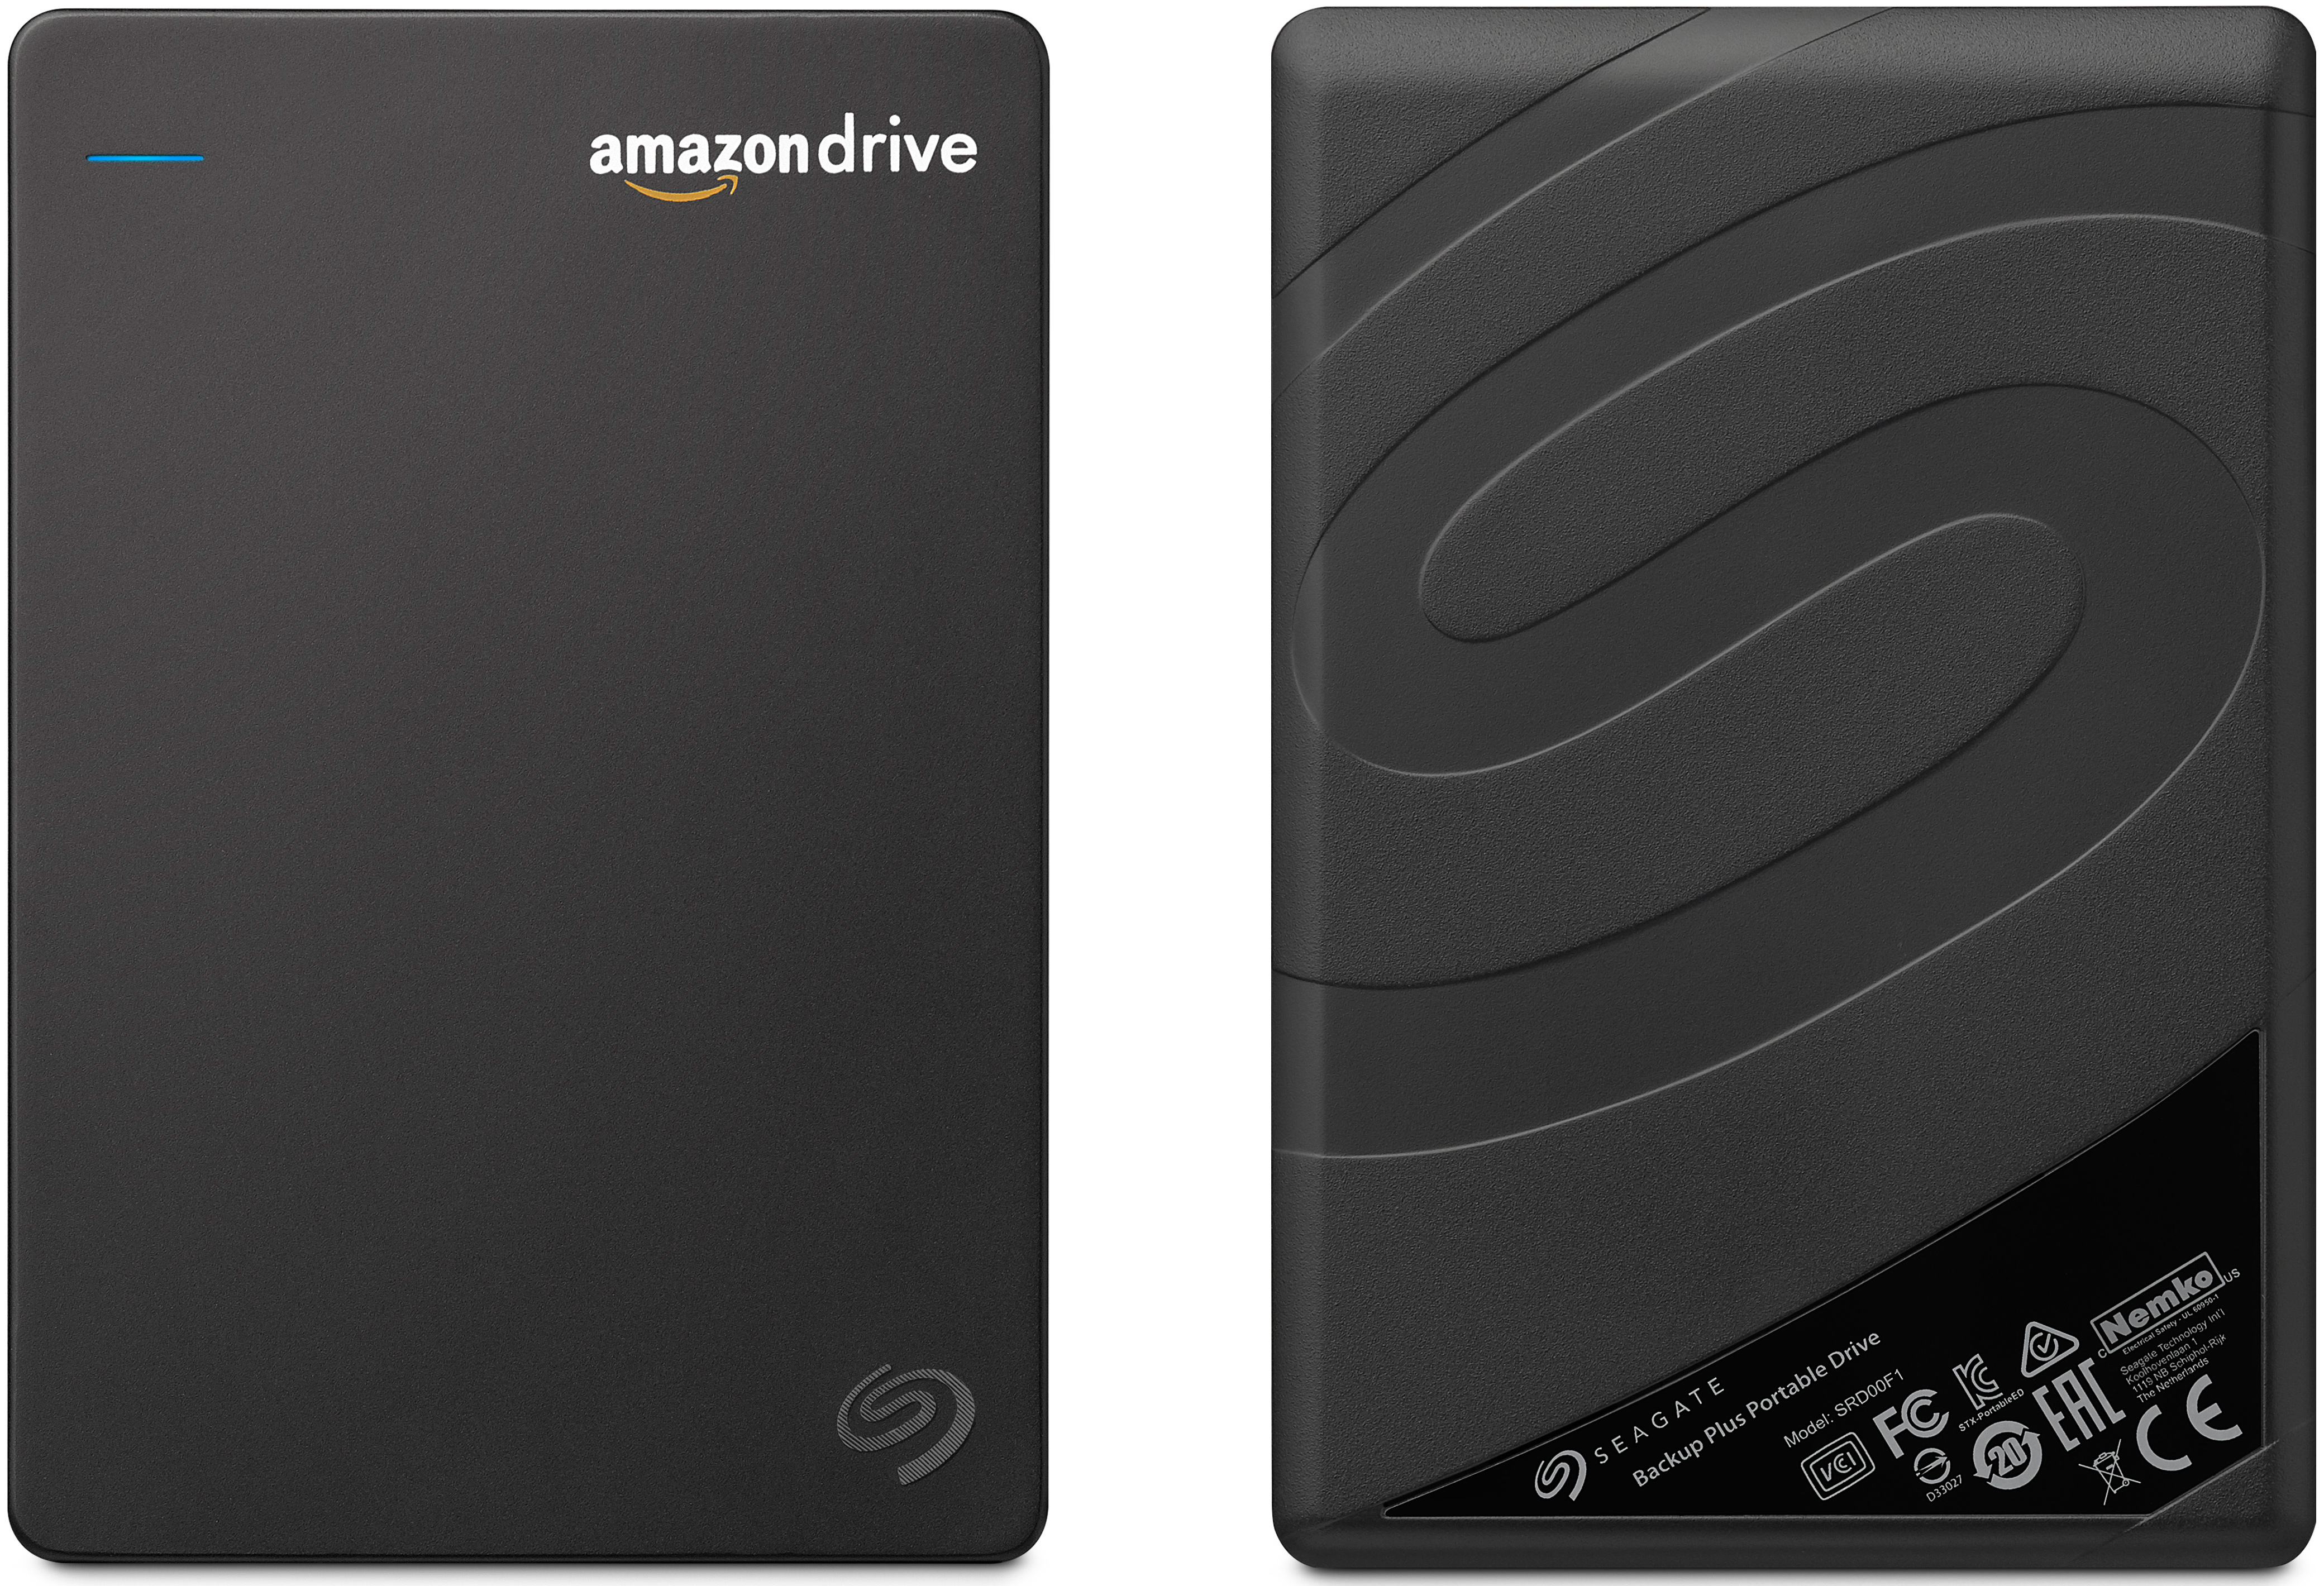 Seagate Announces Duet: An Amazon Cloud-Syncing Portable HDD